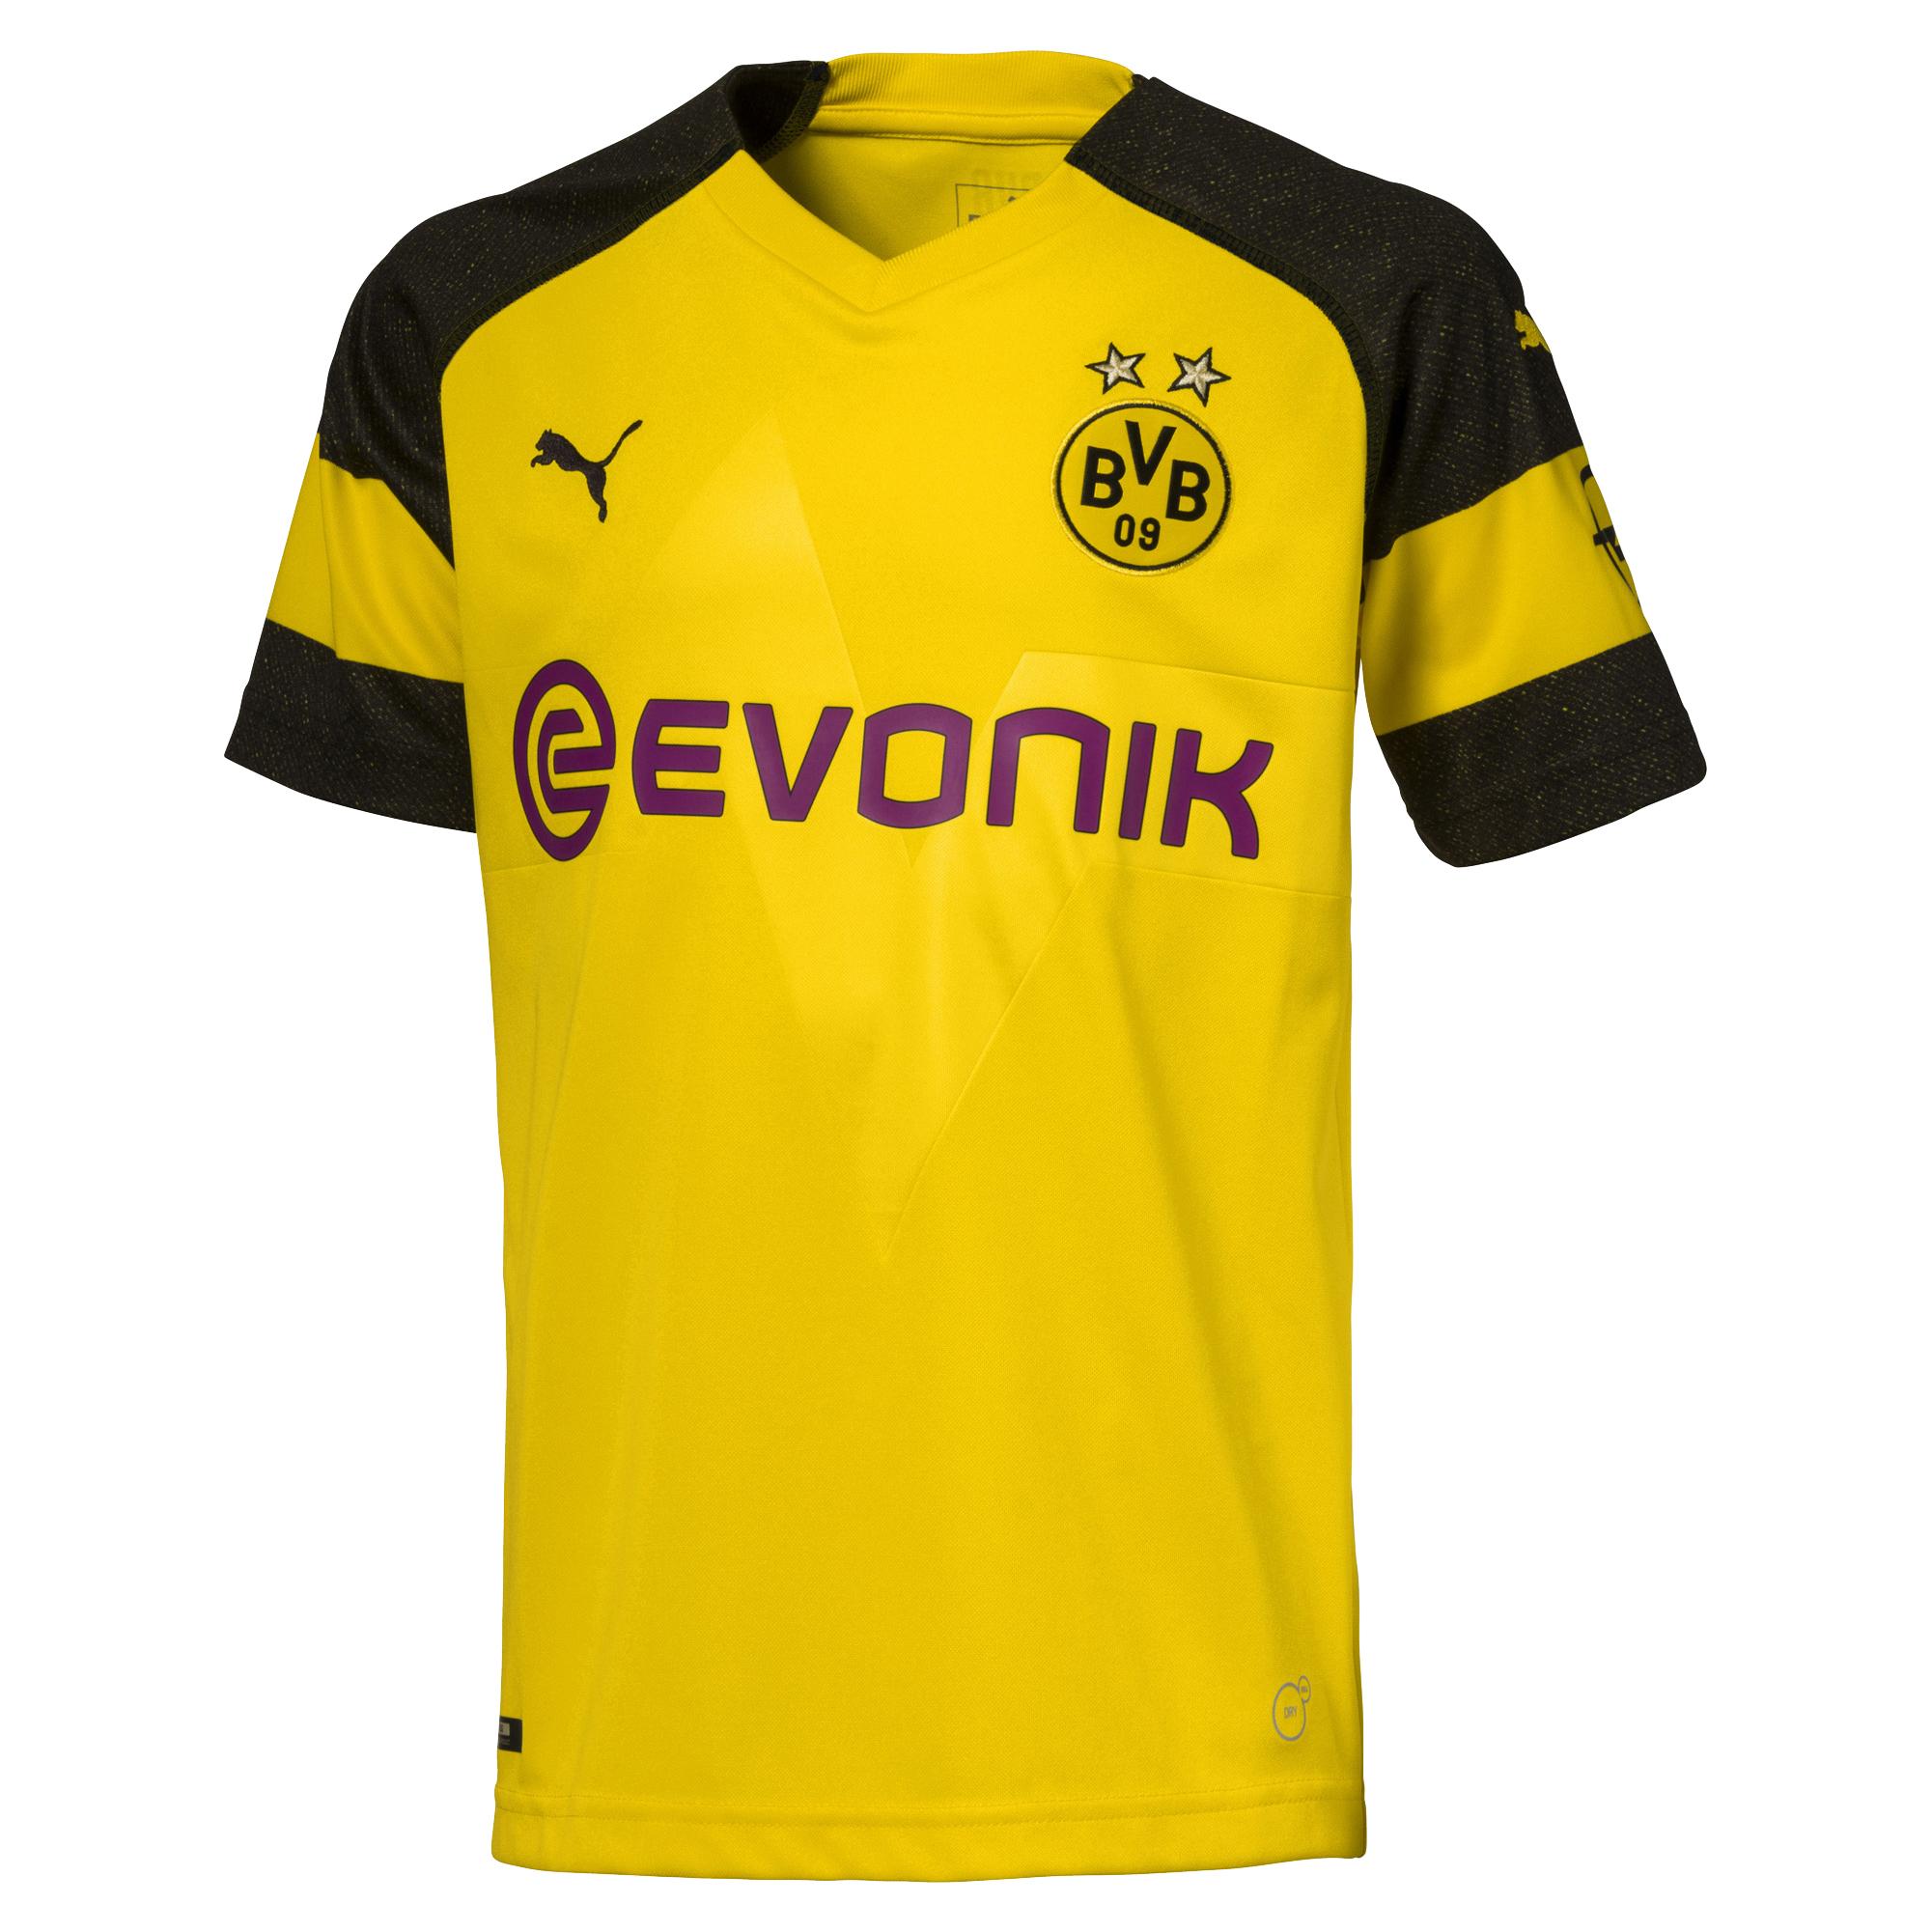 Puma BVB Borussia Dortmund Heimtrikot Saison 2018 / 19 für Herren Gr. S - 5XL I oder das Damen-Trikot oder das Kinder-Trikot oder das Torwart-Trikot zum gleichen Preis